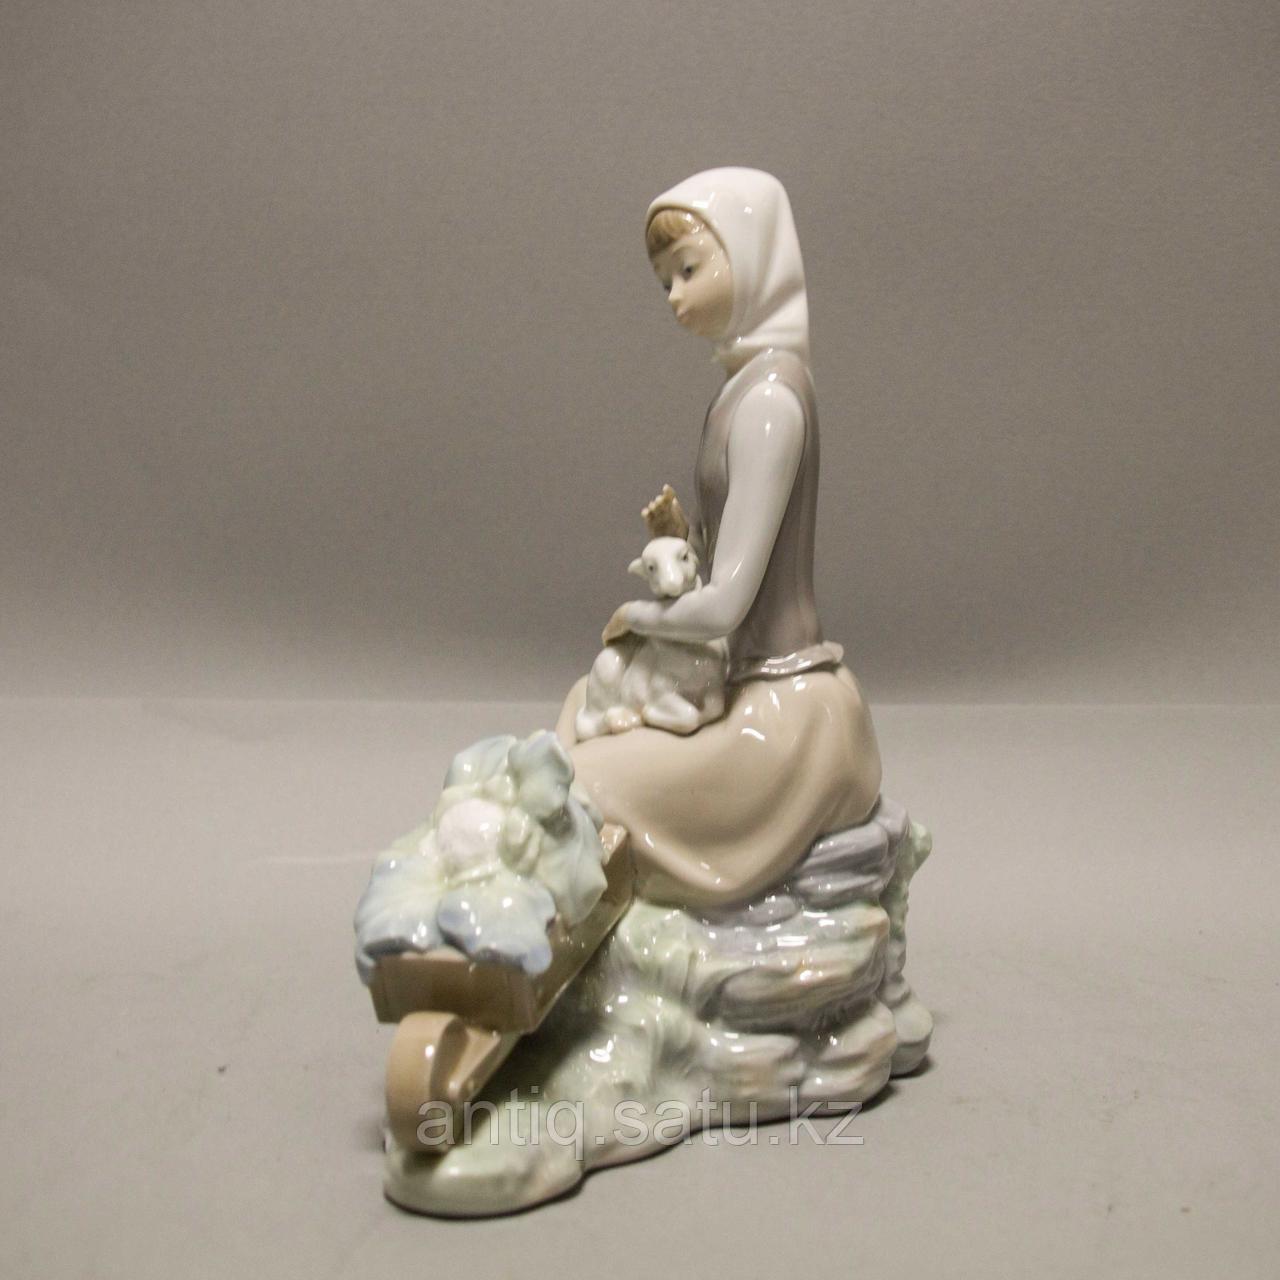 Девочка с ягненком. Фарфоровая мануфактура Lladro - фото 2